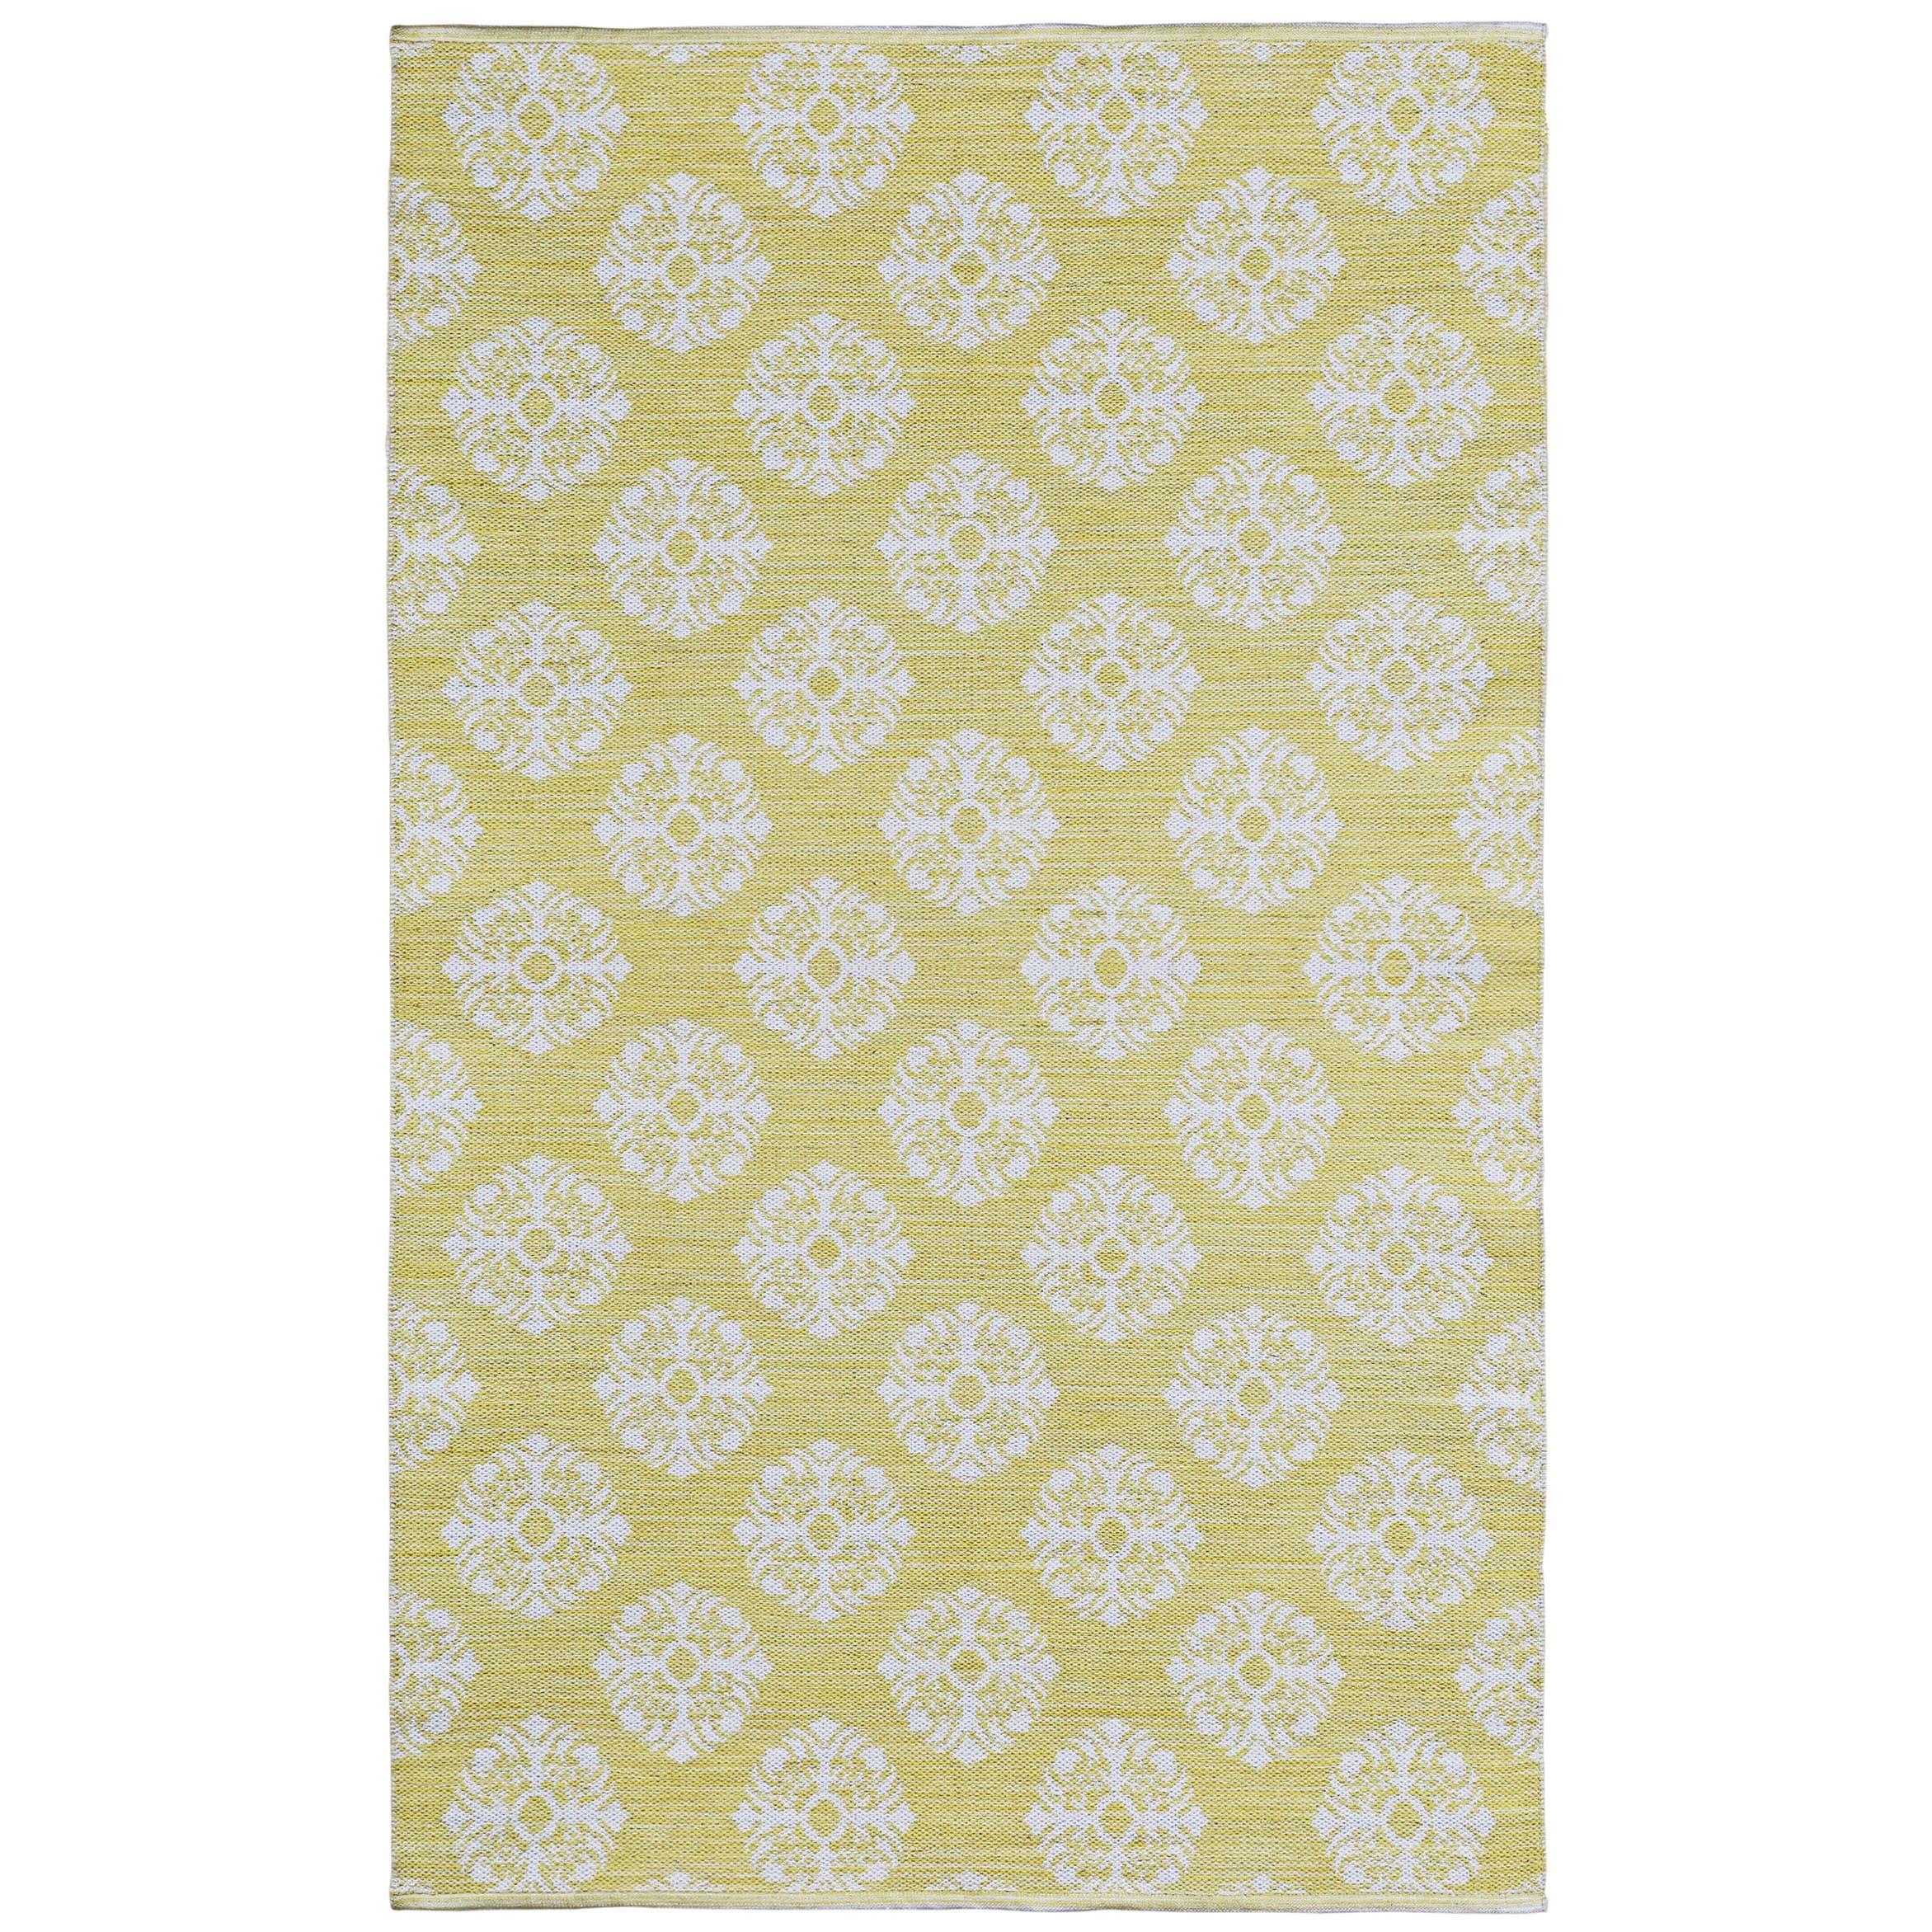 St. Croix Yellow Medallion Cotton Jacquard Rug (4'x6') (Y...